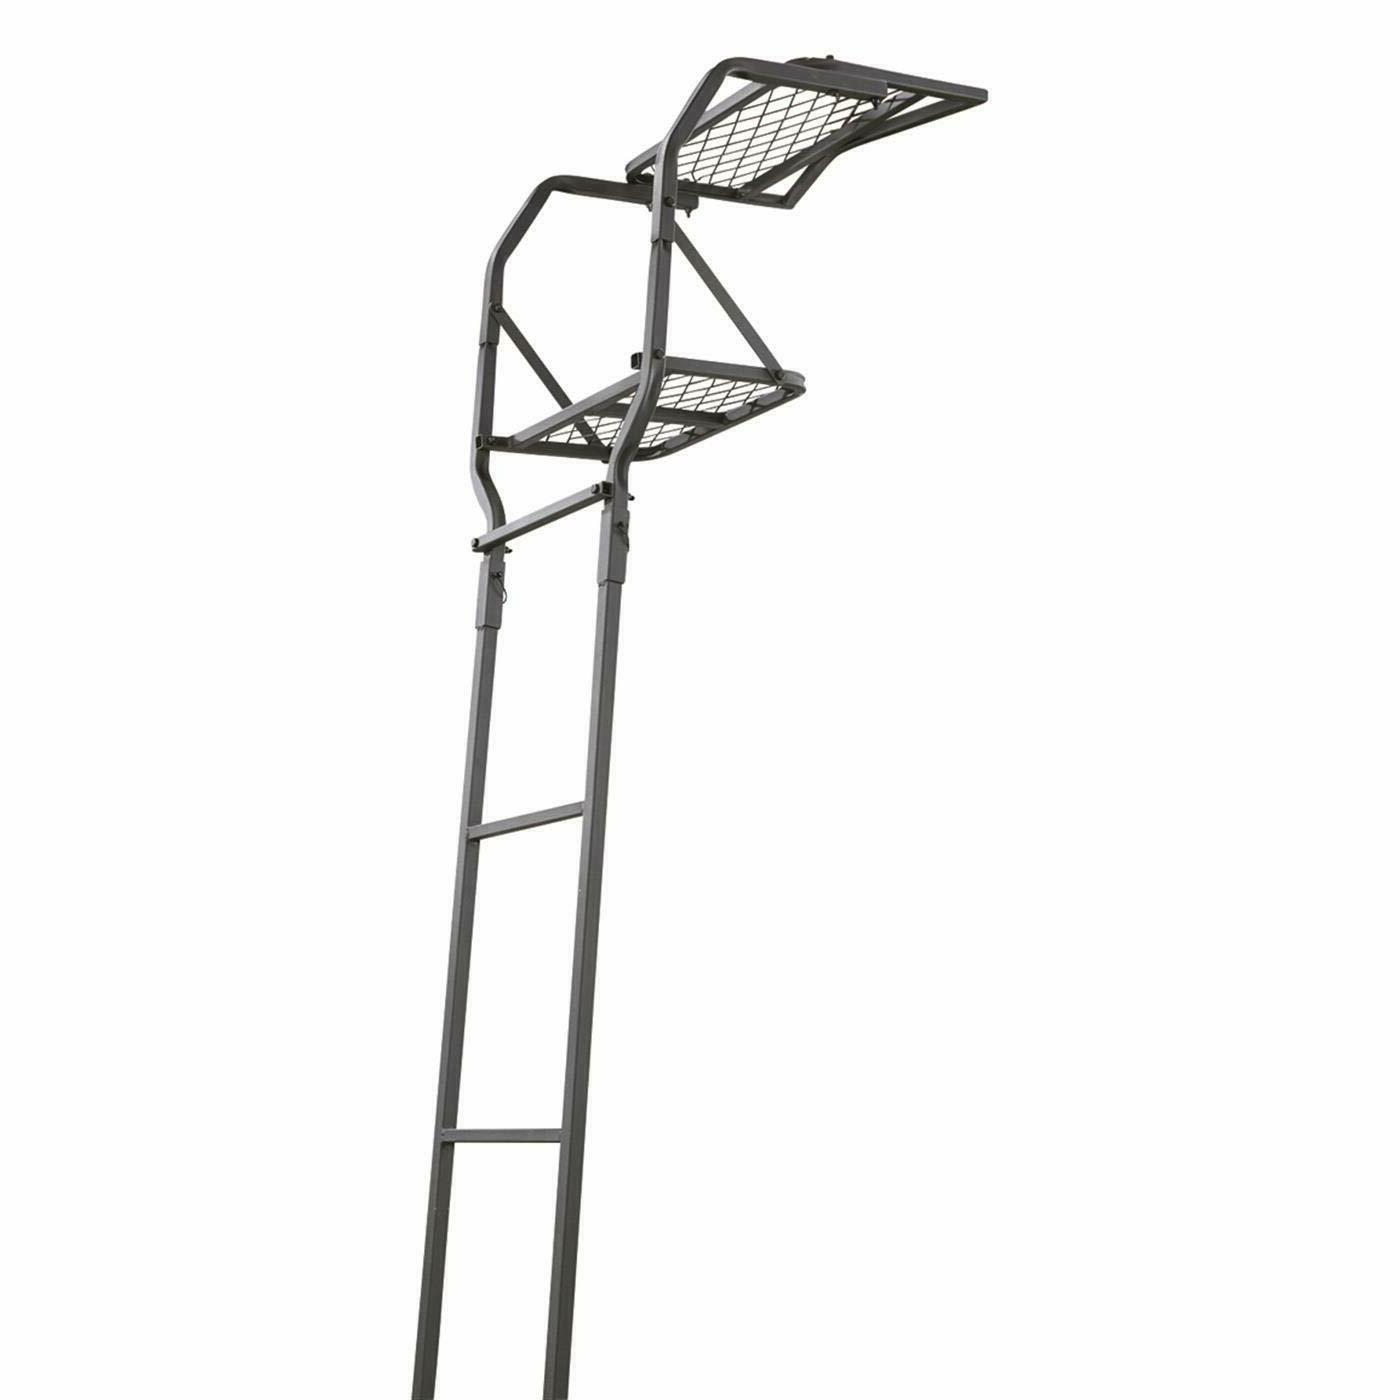 Guide Gear 15' Ladder Tree Stand Platform Hunting Seat Man P